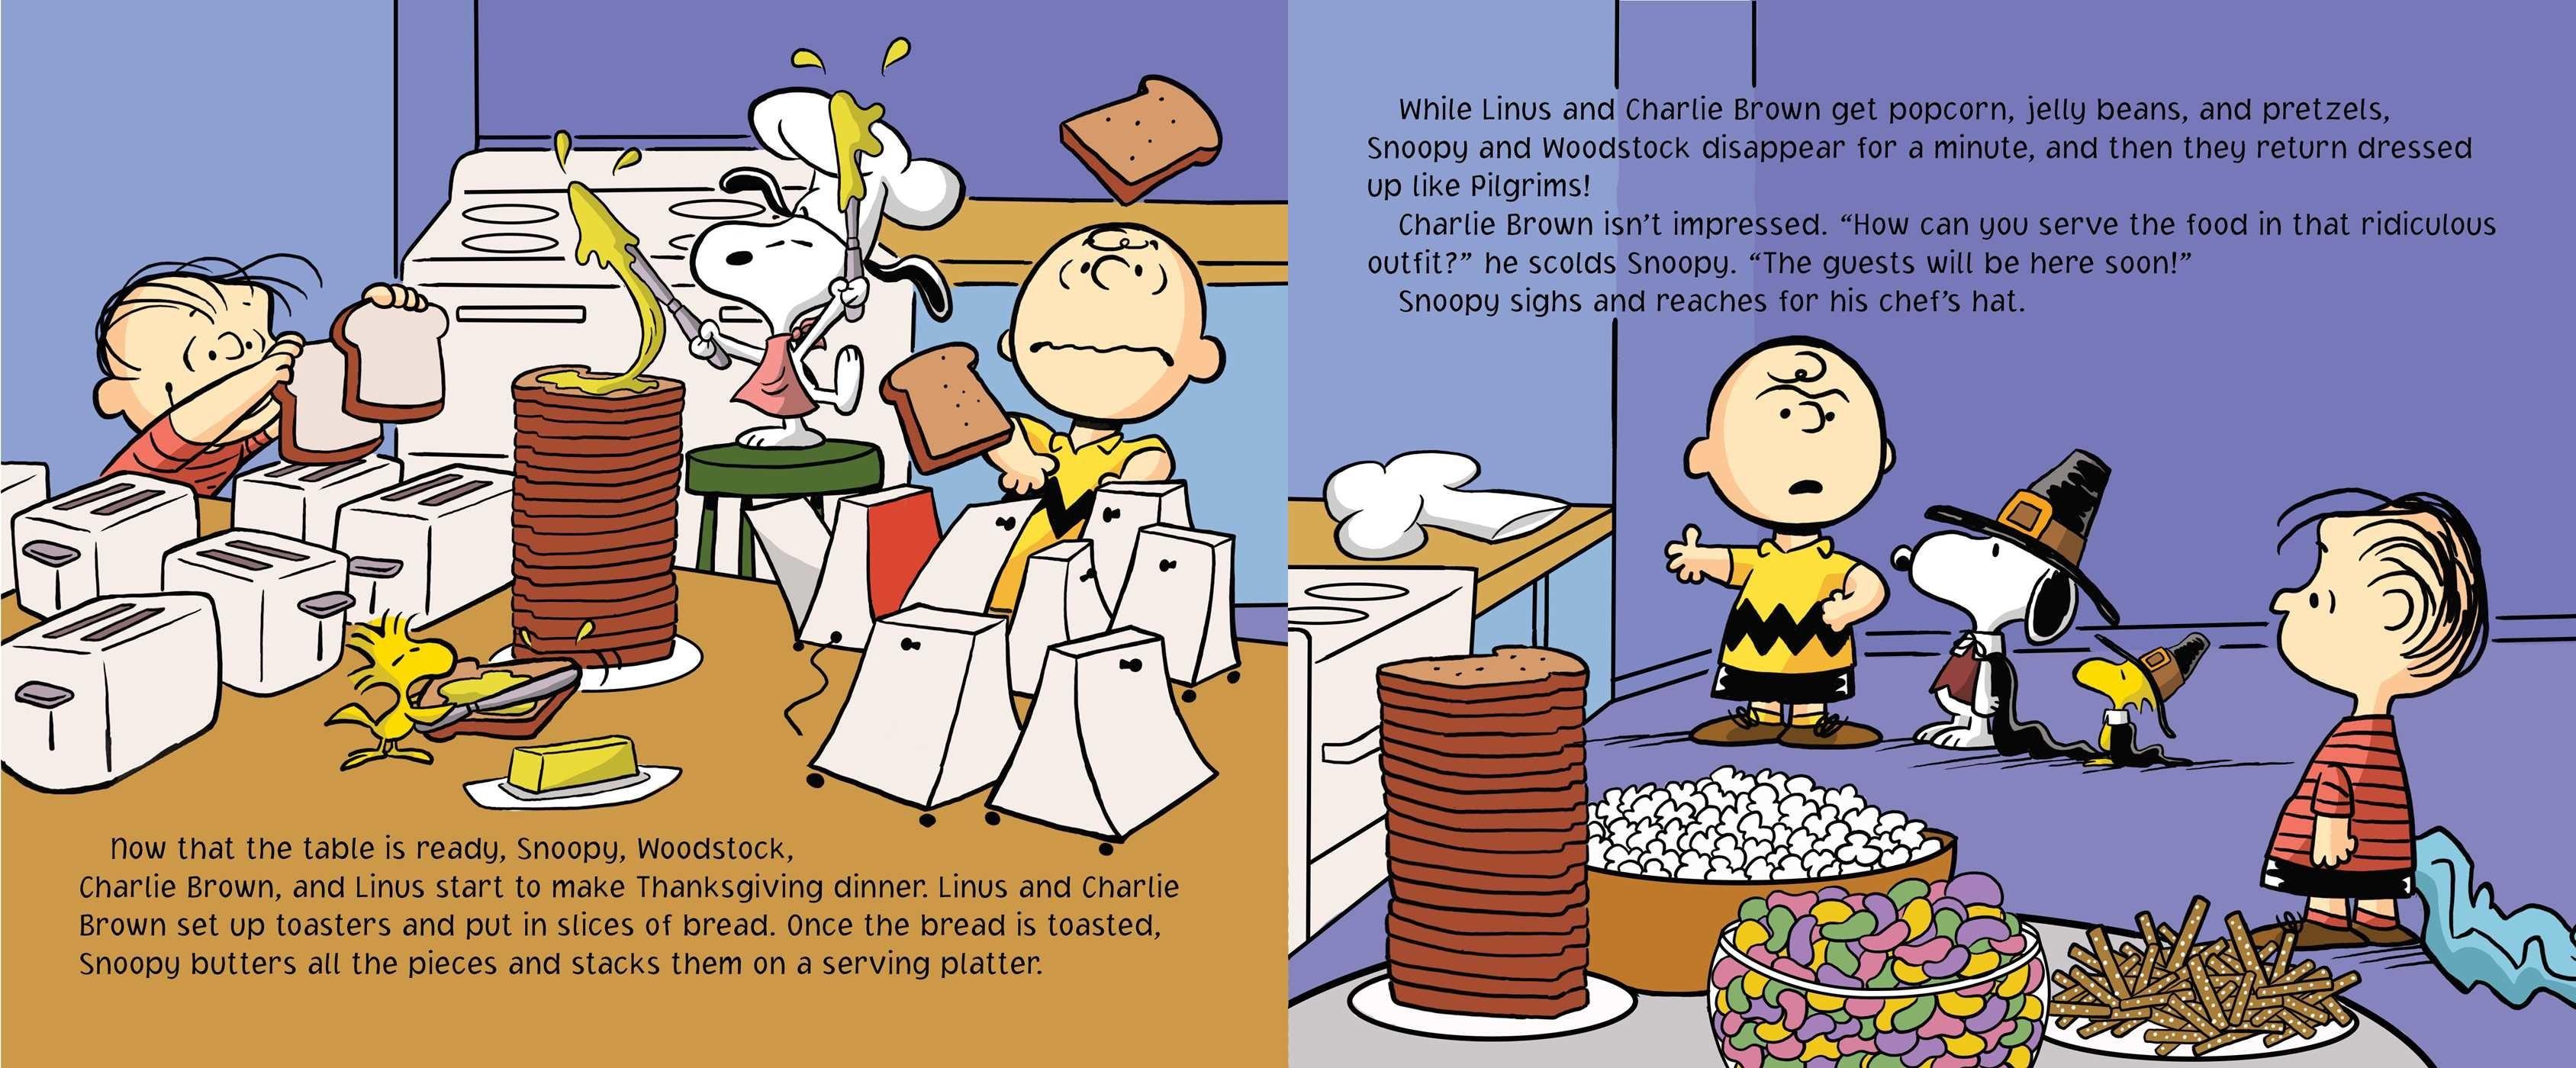 1920x1200 Snoopy Peanuts Thanksgiving Wallpaper